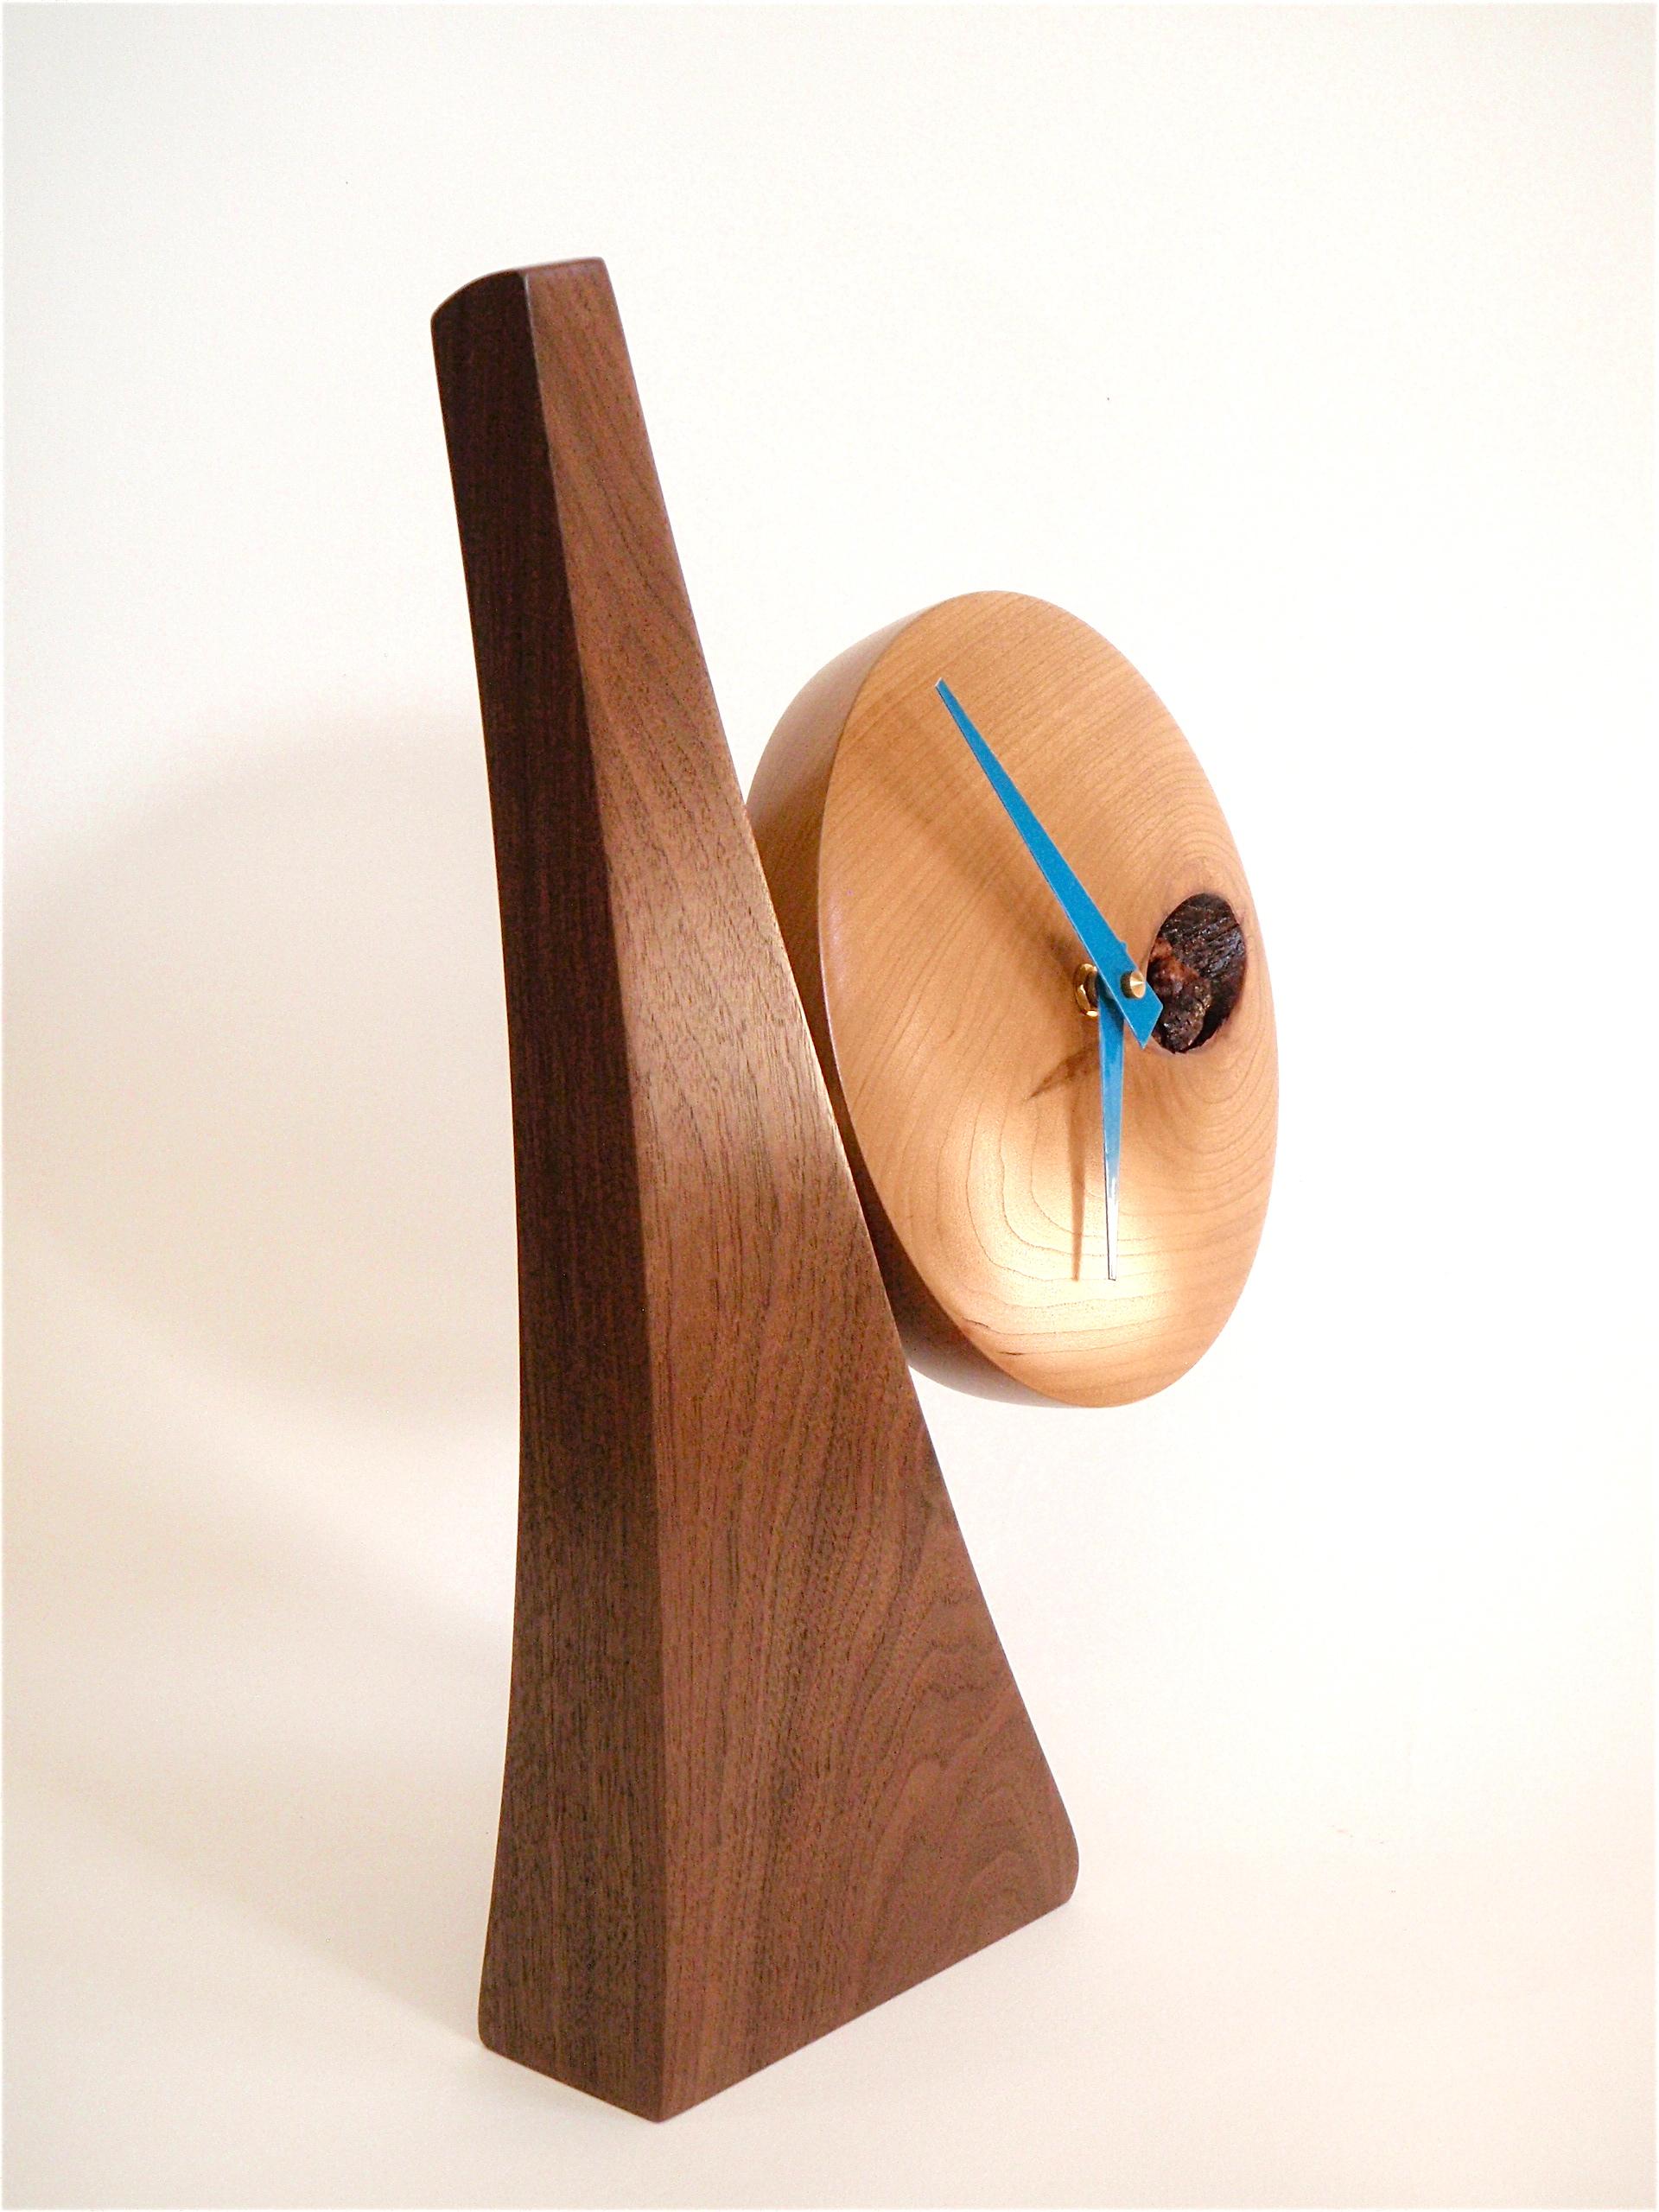 Adjustable desk clock 01